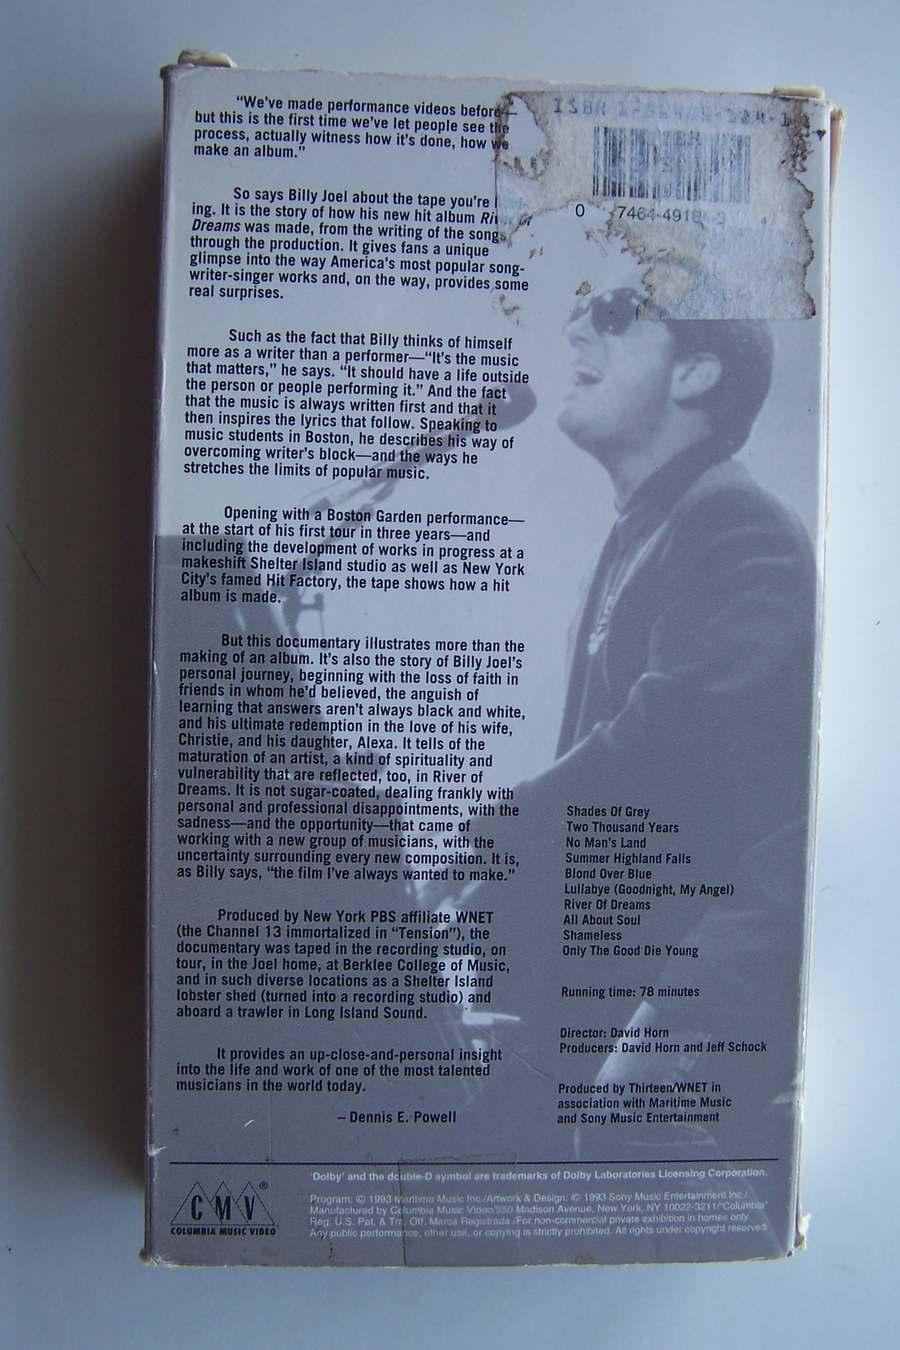 Billy Joel Shades of Grey VHS Tape 1993